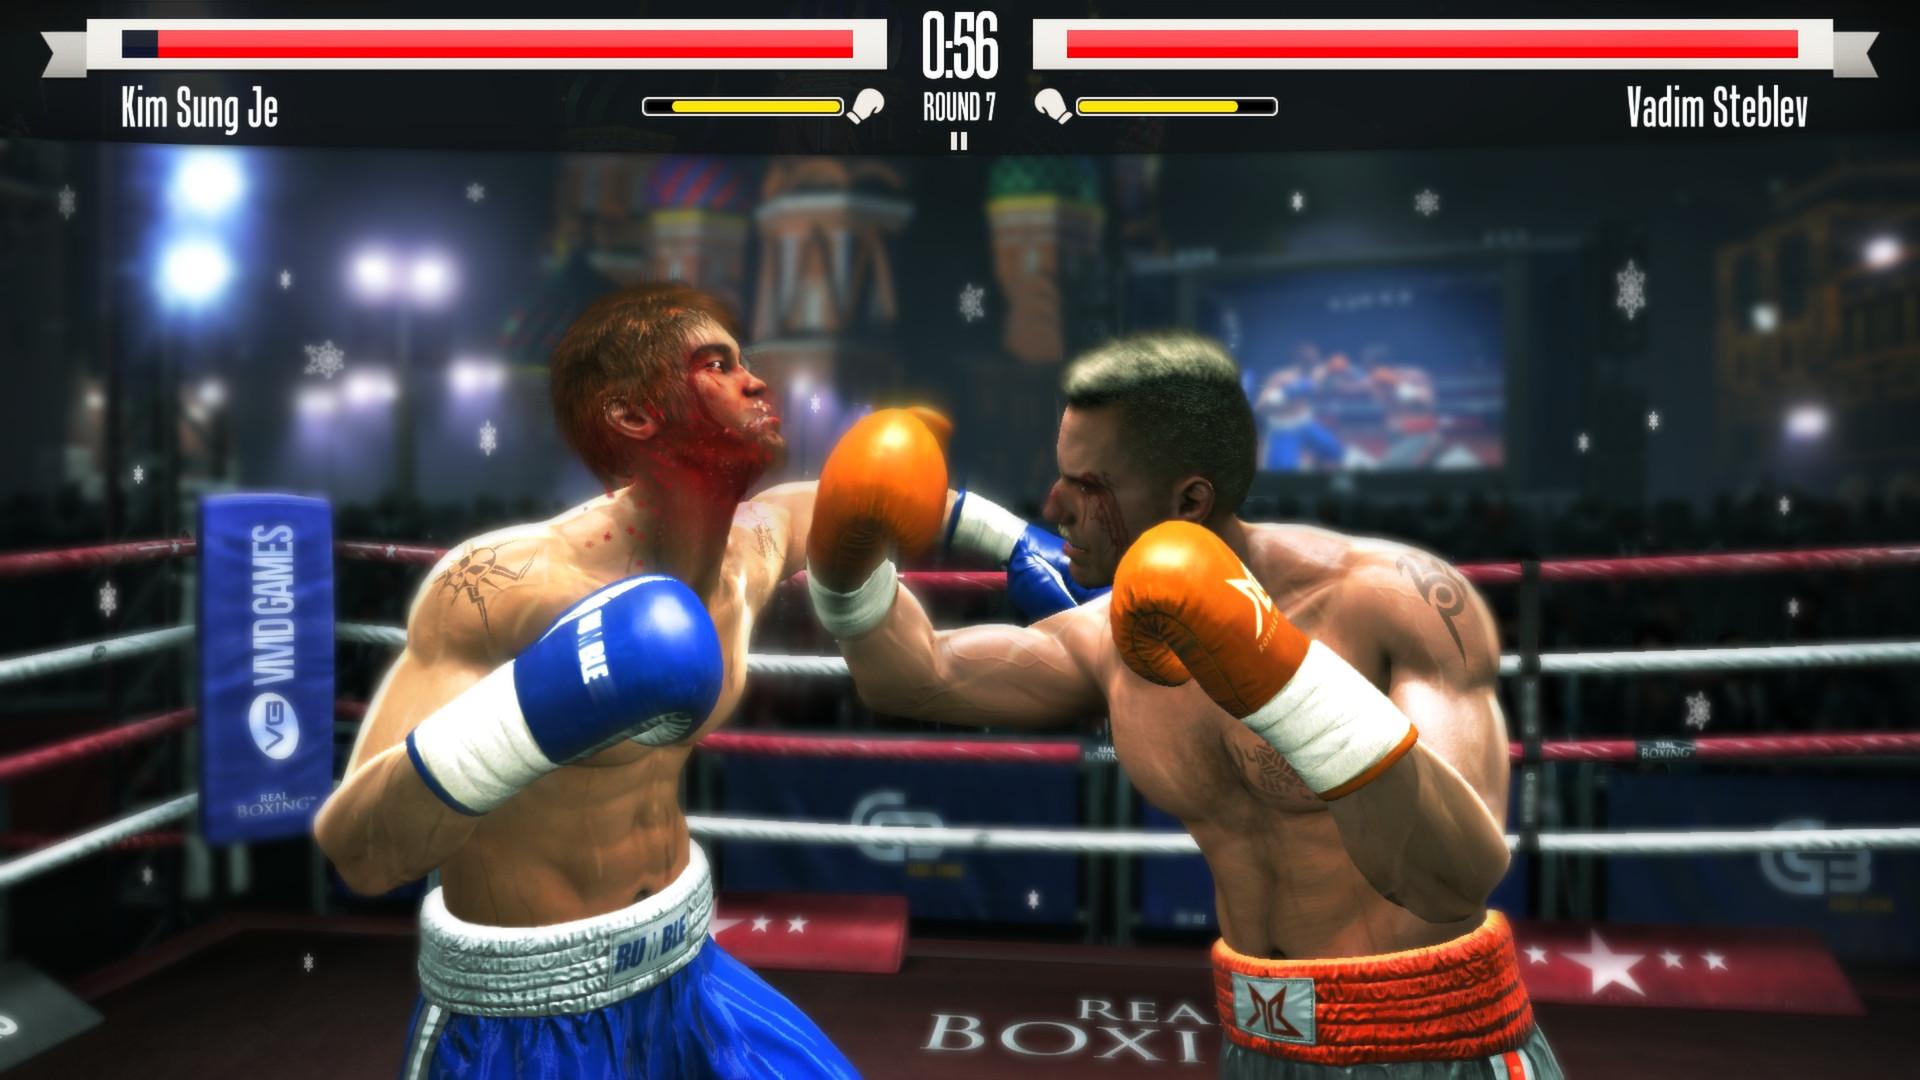 real-boxing-pc-screenshot-04